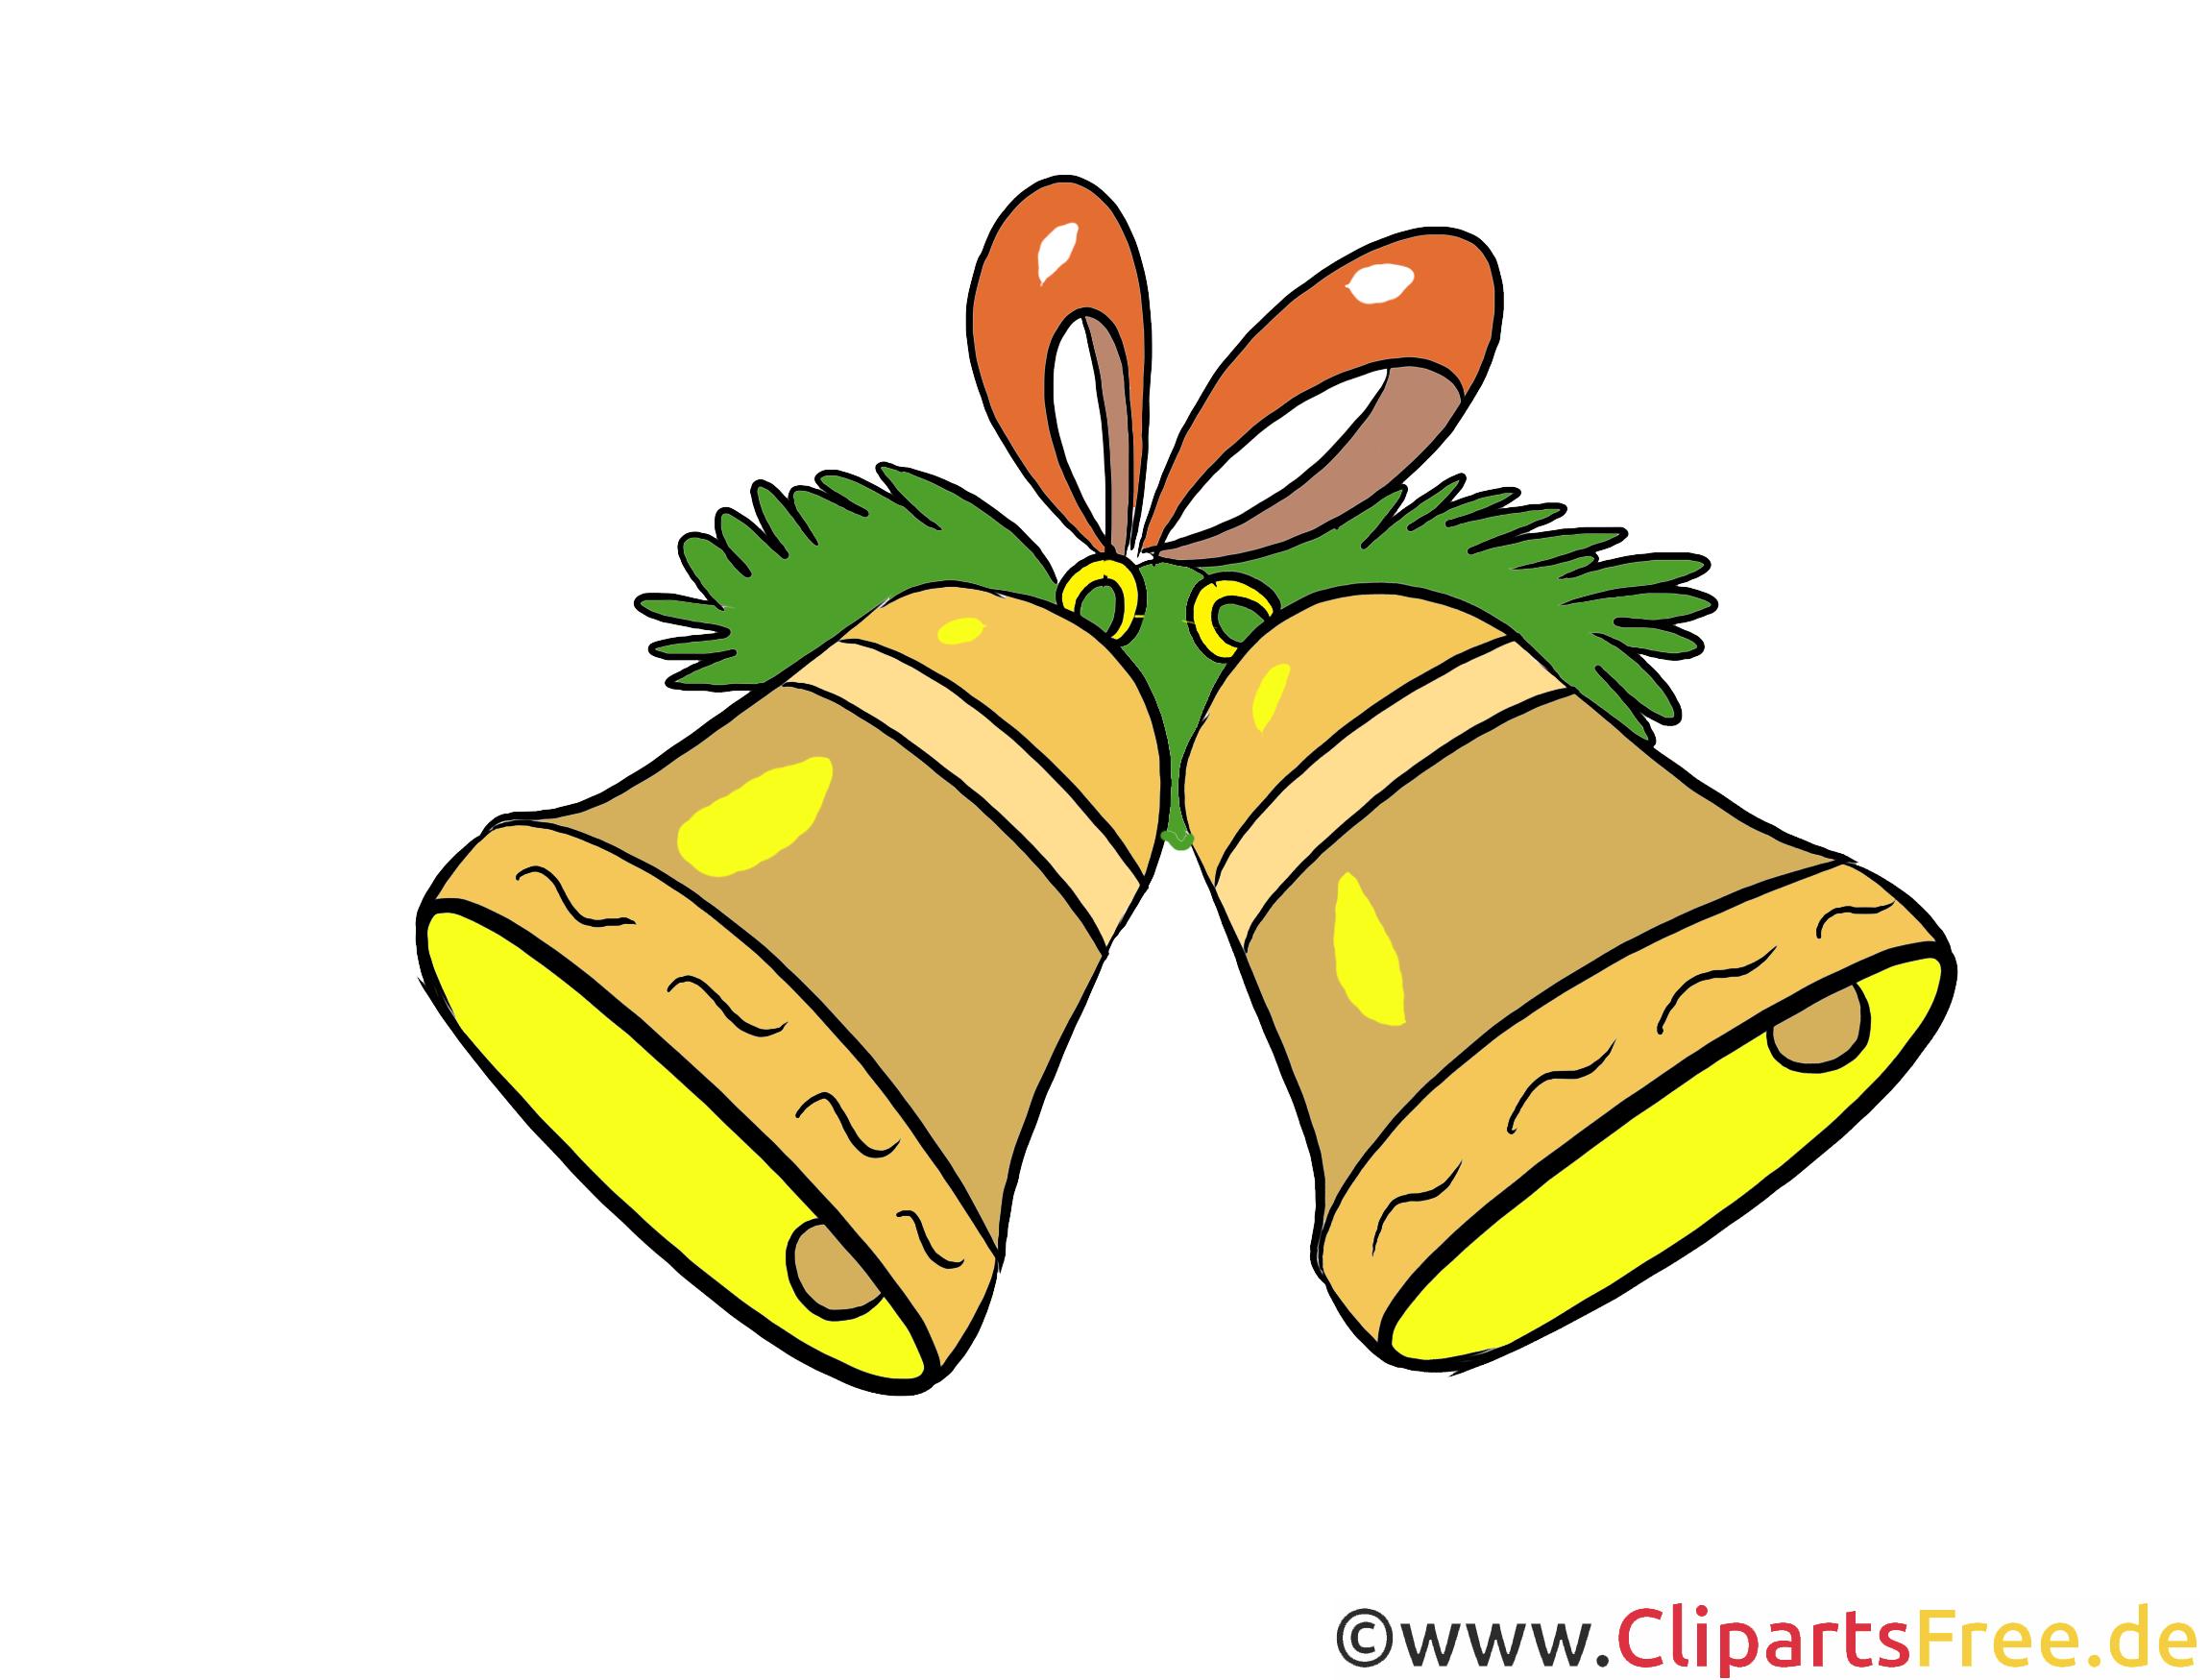 Glocken Bild, Illustration, Clipart, Grafik